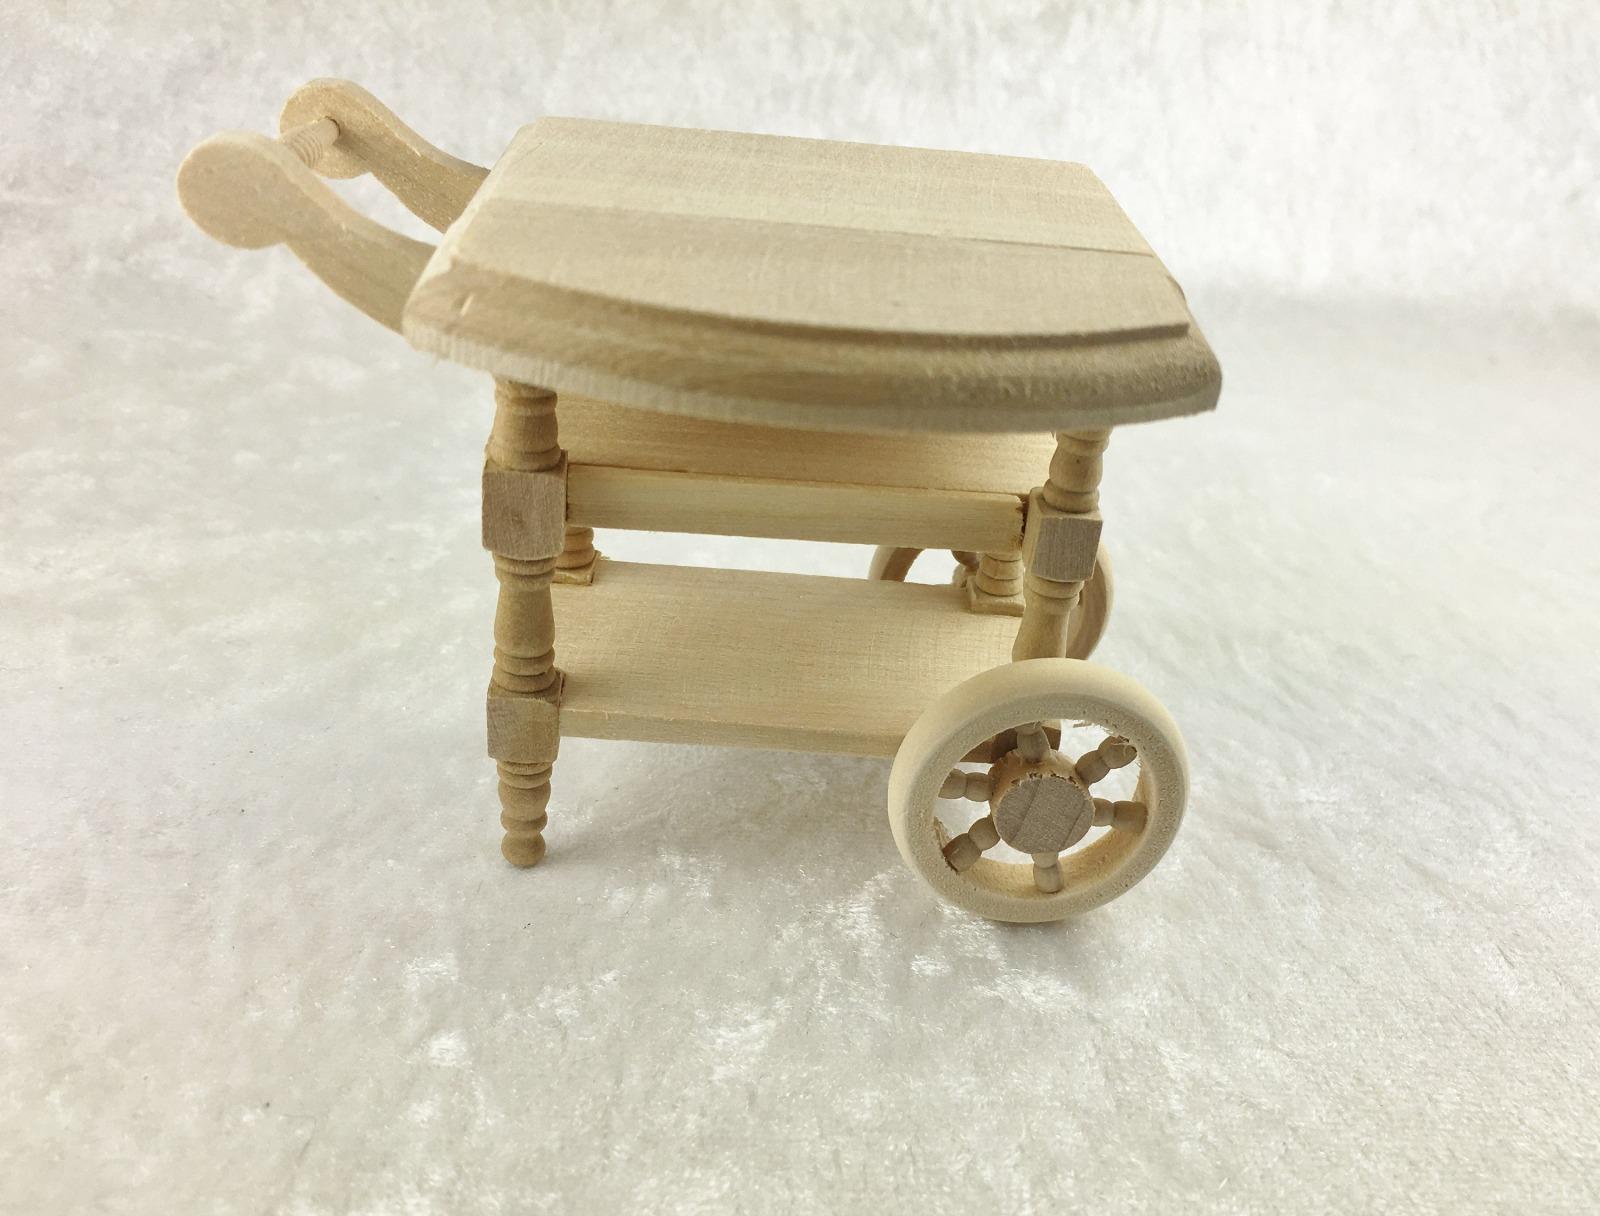 Teewagen 1:12 Miniatur 8